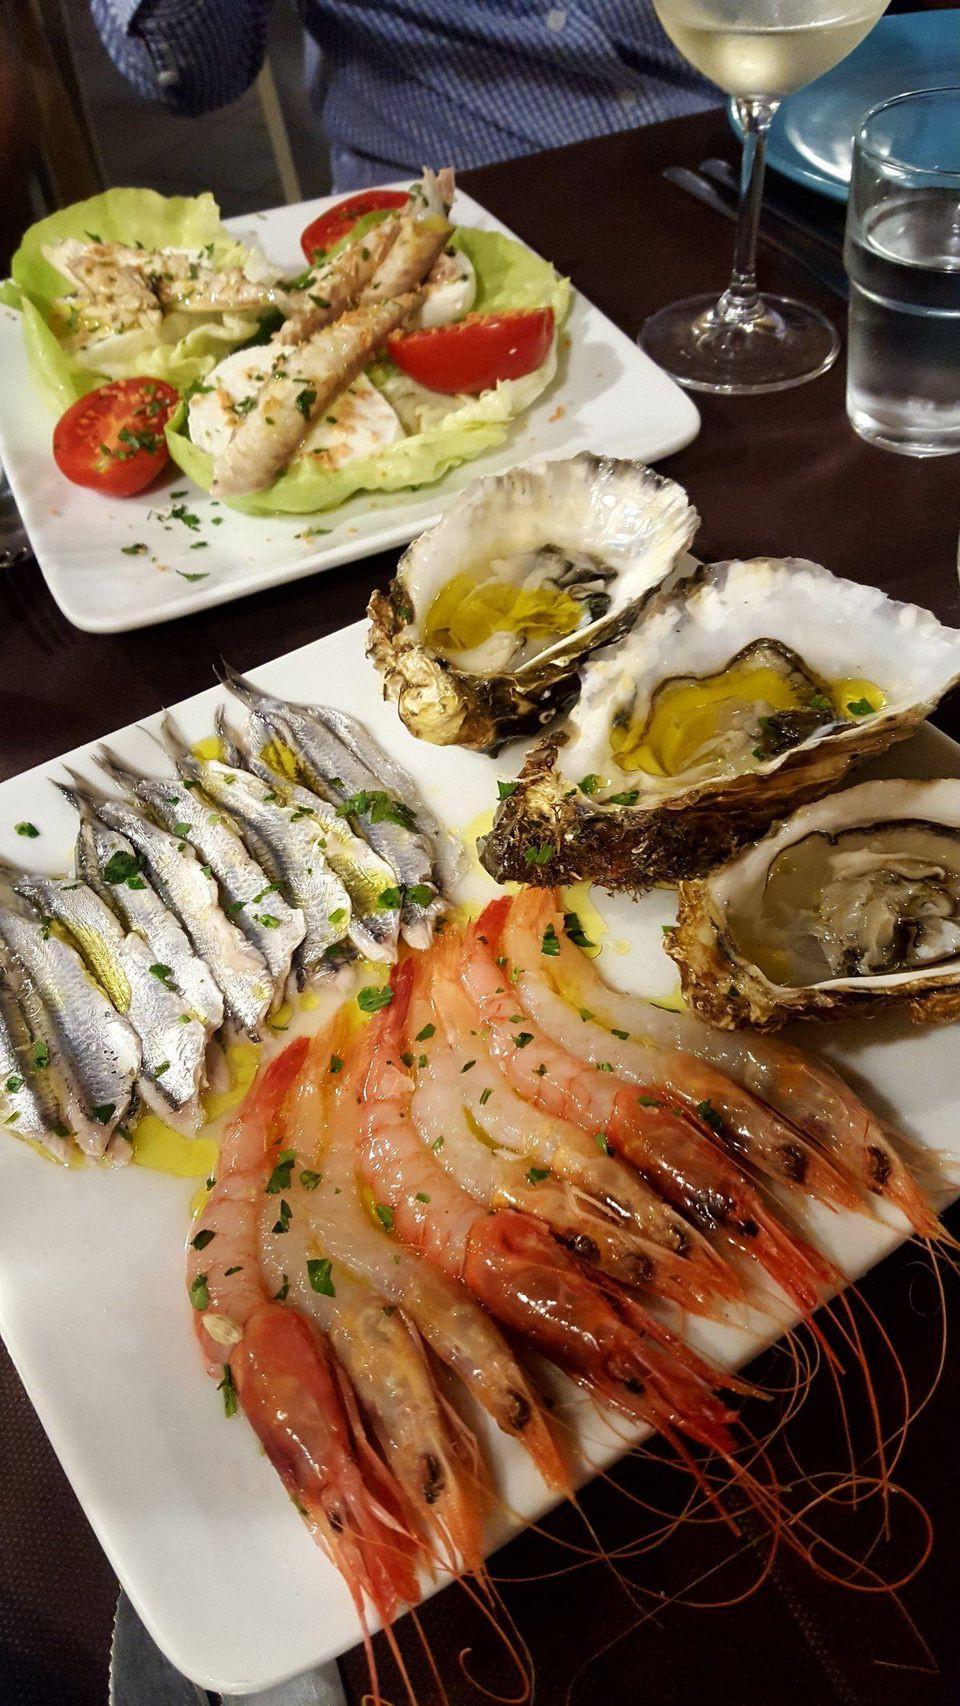 The seafood antipasto at Apollonion Osteria da Carlo in Ortigia practically swims off the plate. ALEXANDRA KIRKMAN